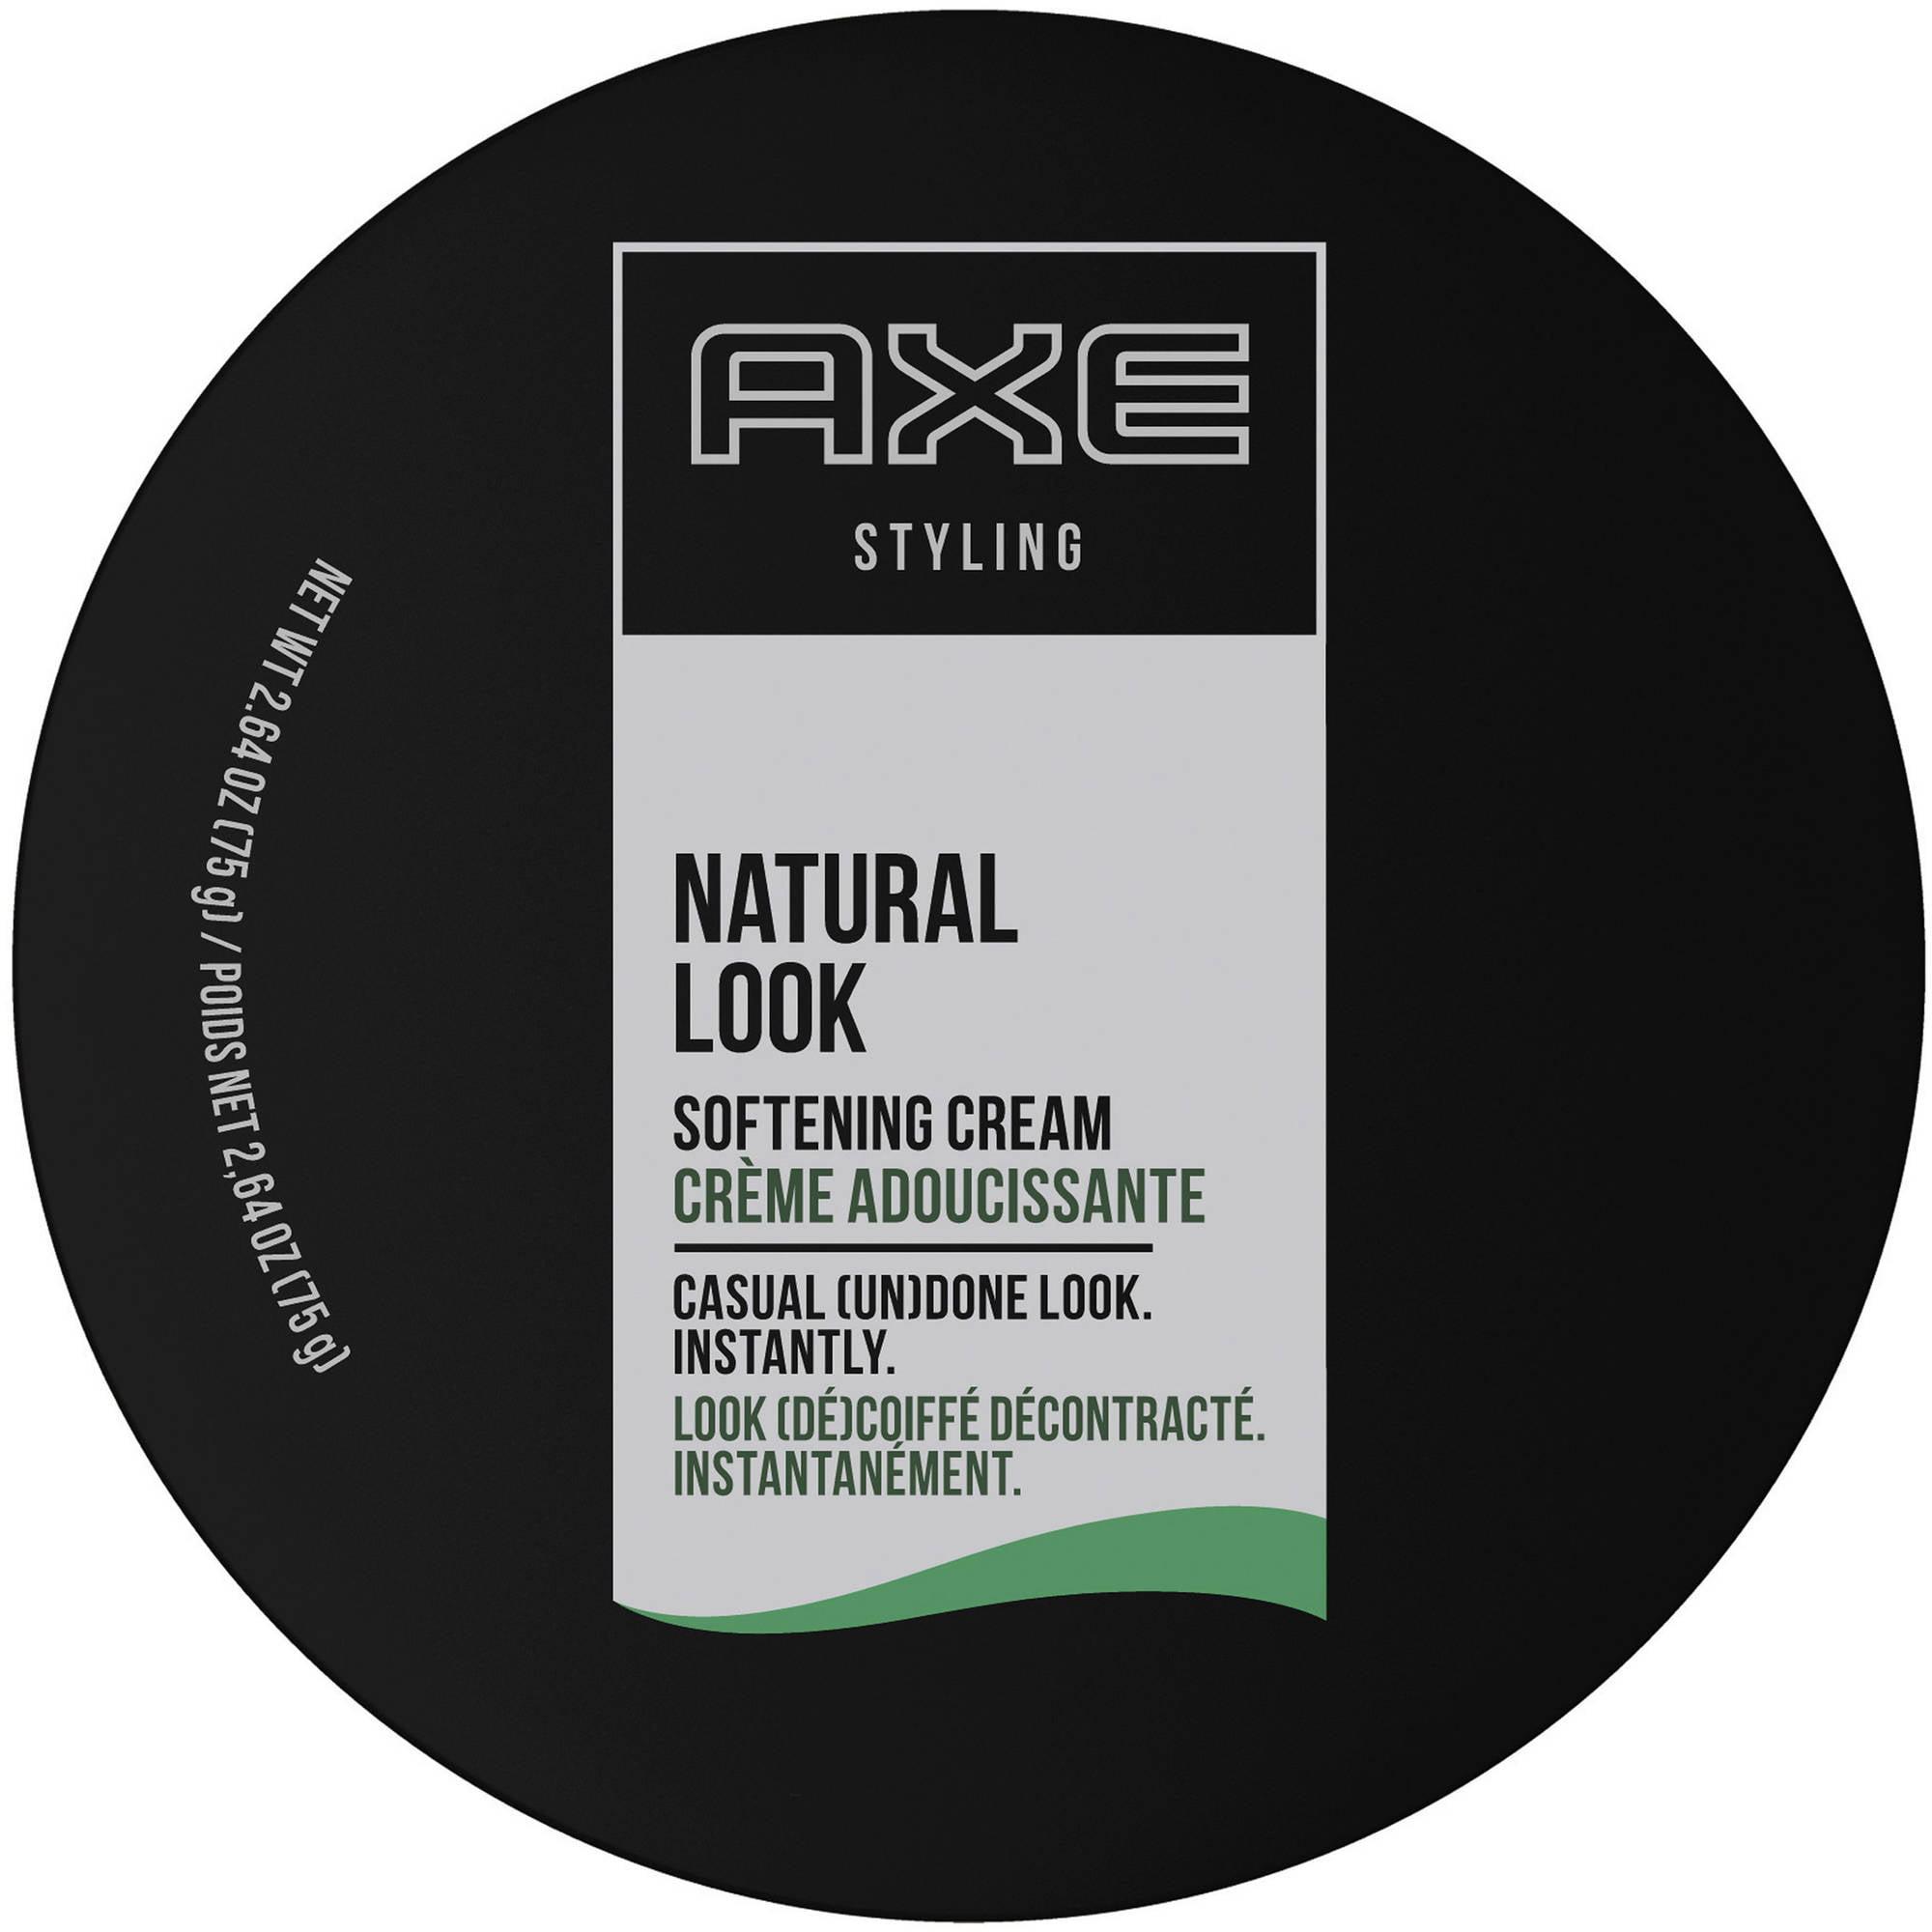 AXE Natural Look Softening Cream, 2.64 oz